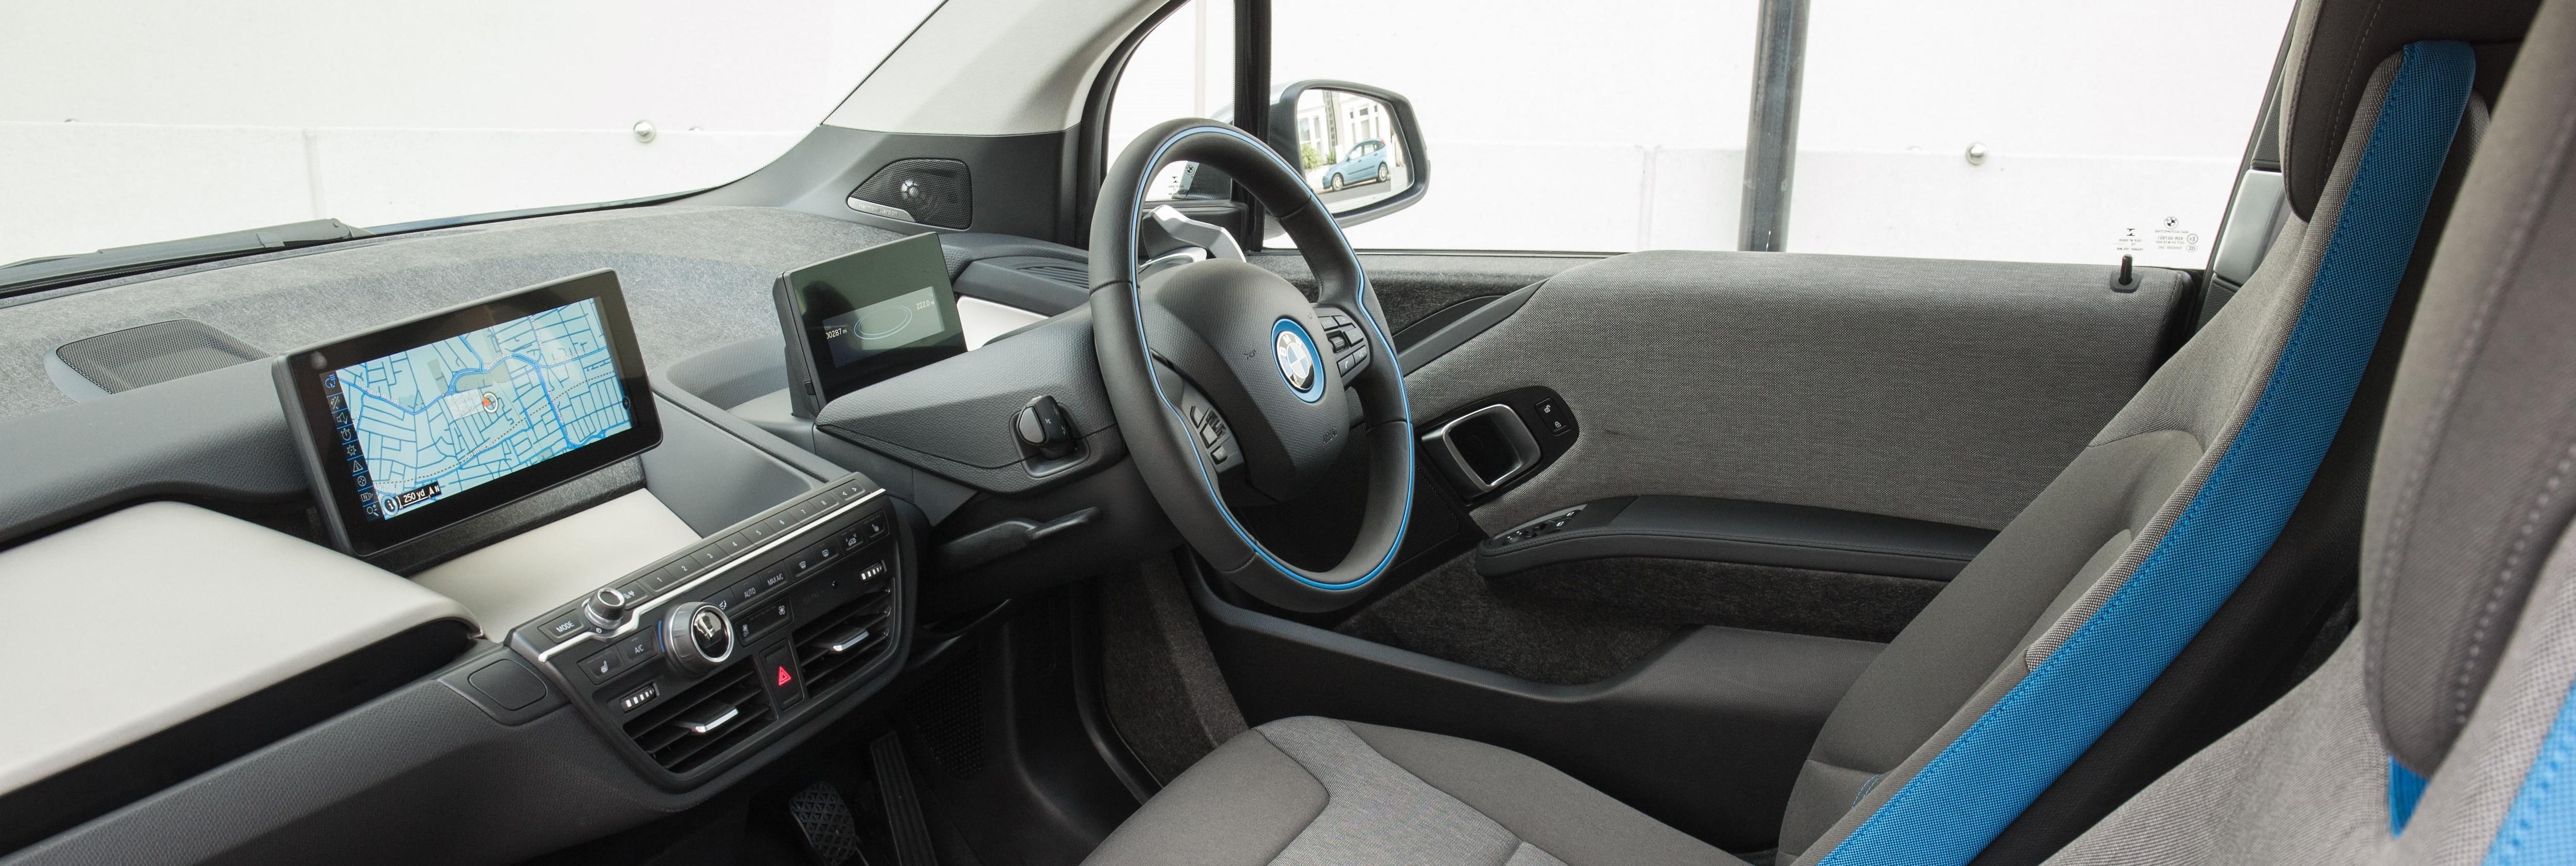 Bmw I3 Review Motors Co Uk